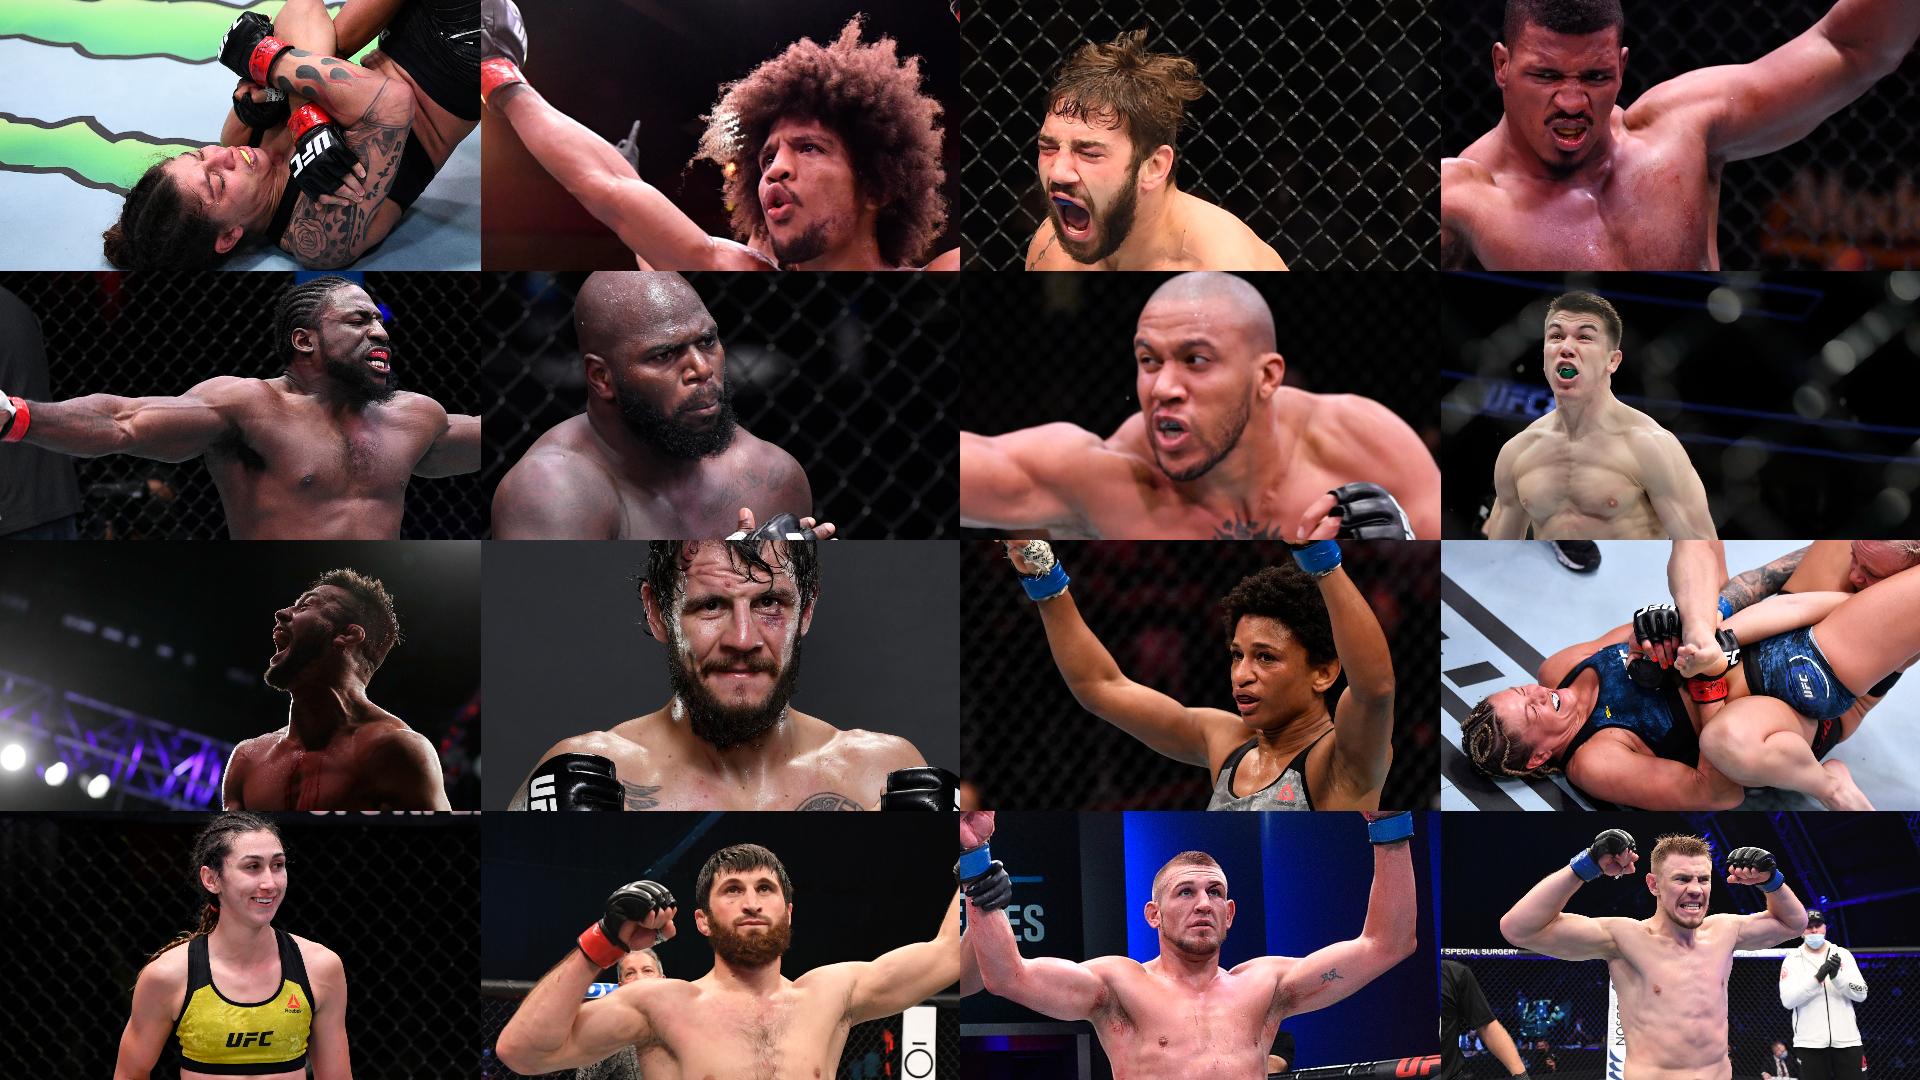 UFC Fight Night Rozenstruik vs Gane Athletes